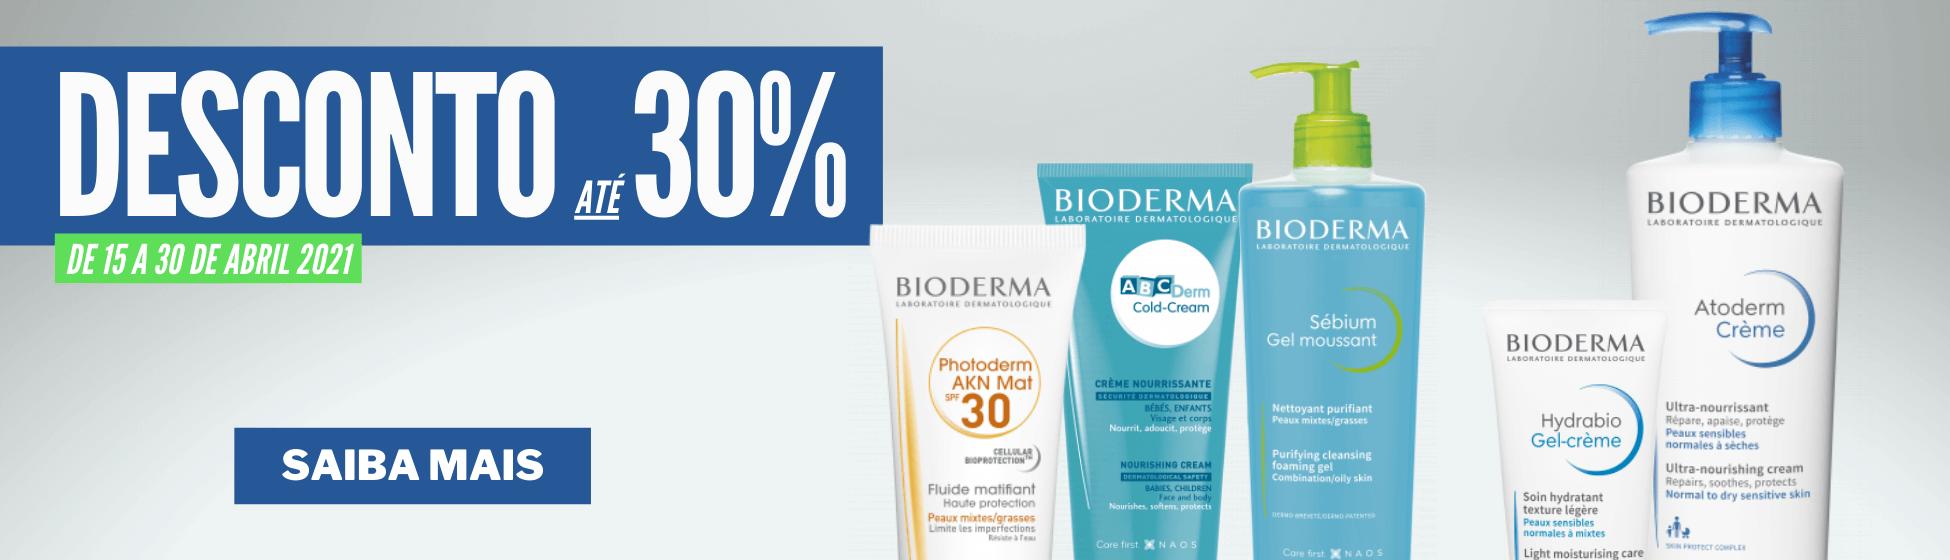 bioderma-Portugal-Promocao-abril (1)